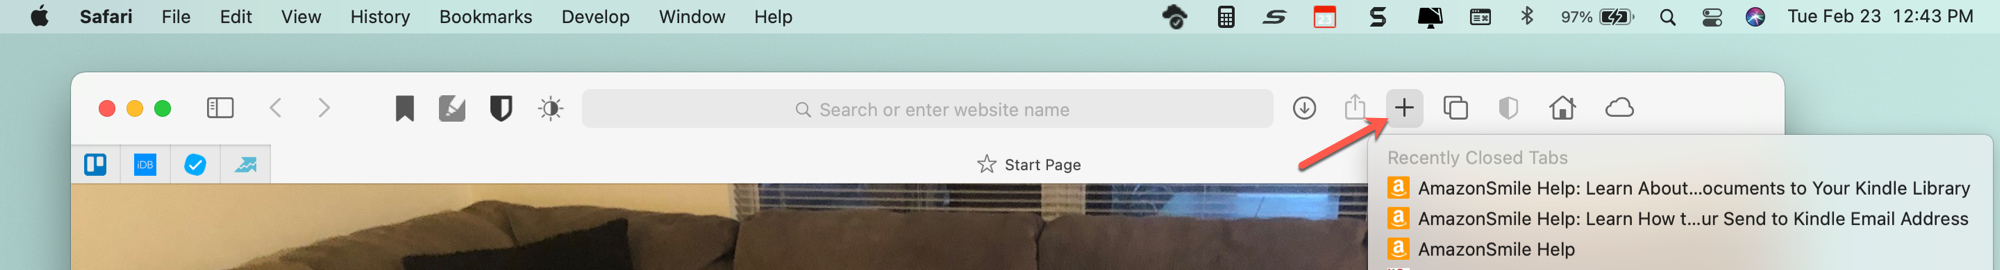 New Tab Button Safari Toolbar